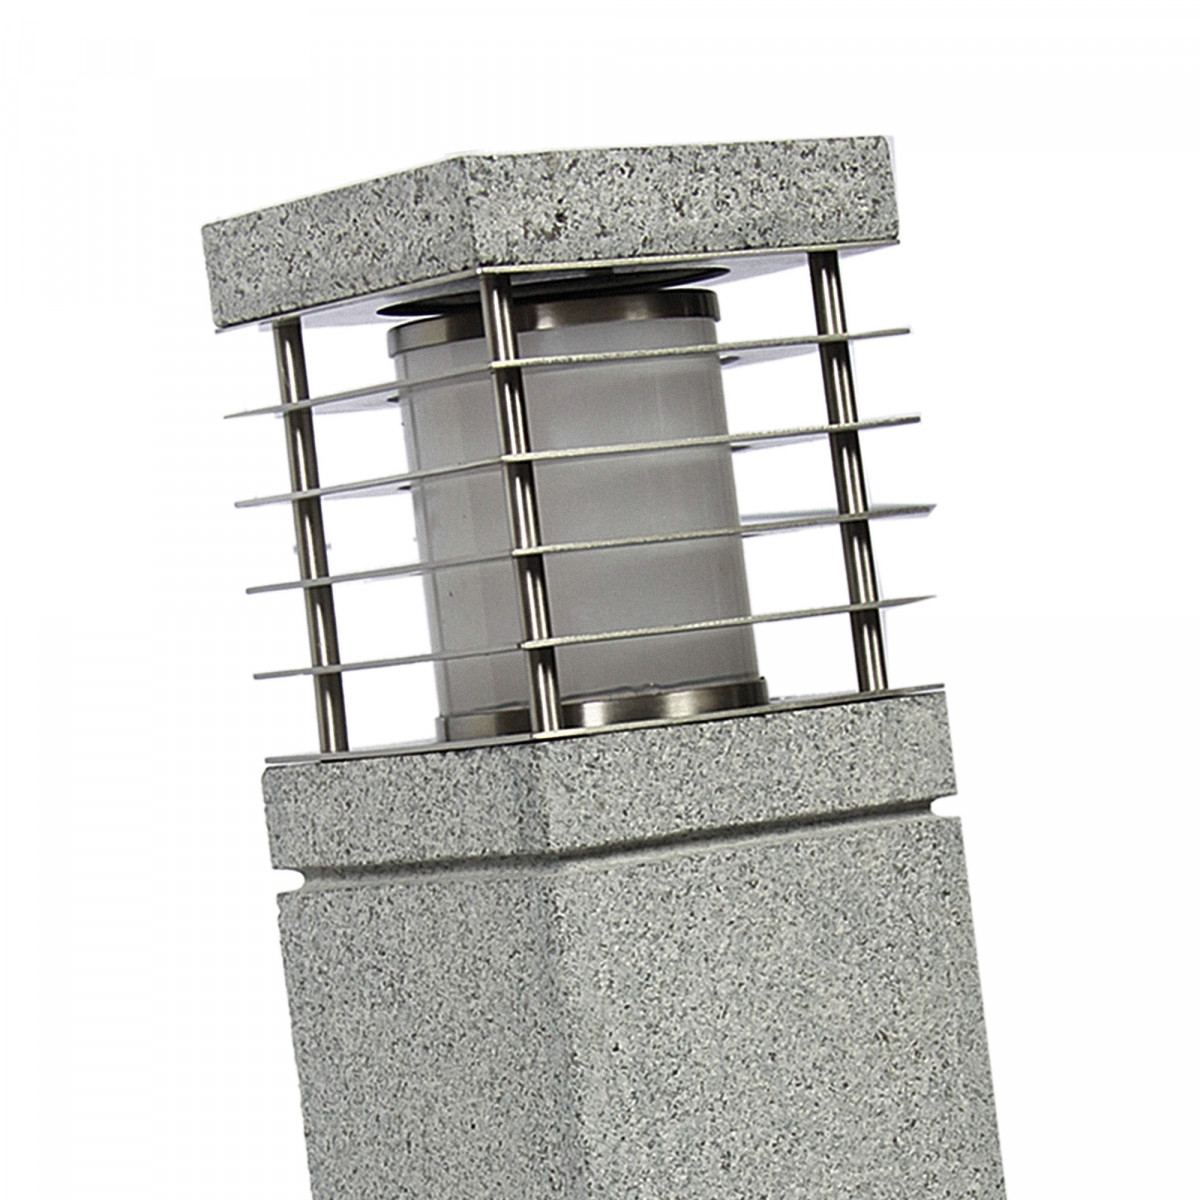 Pilar Graniet Tuinlamp (7382) - KS Verlichting - Design & Exclusief